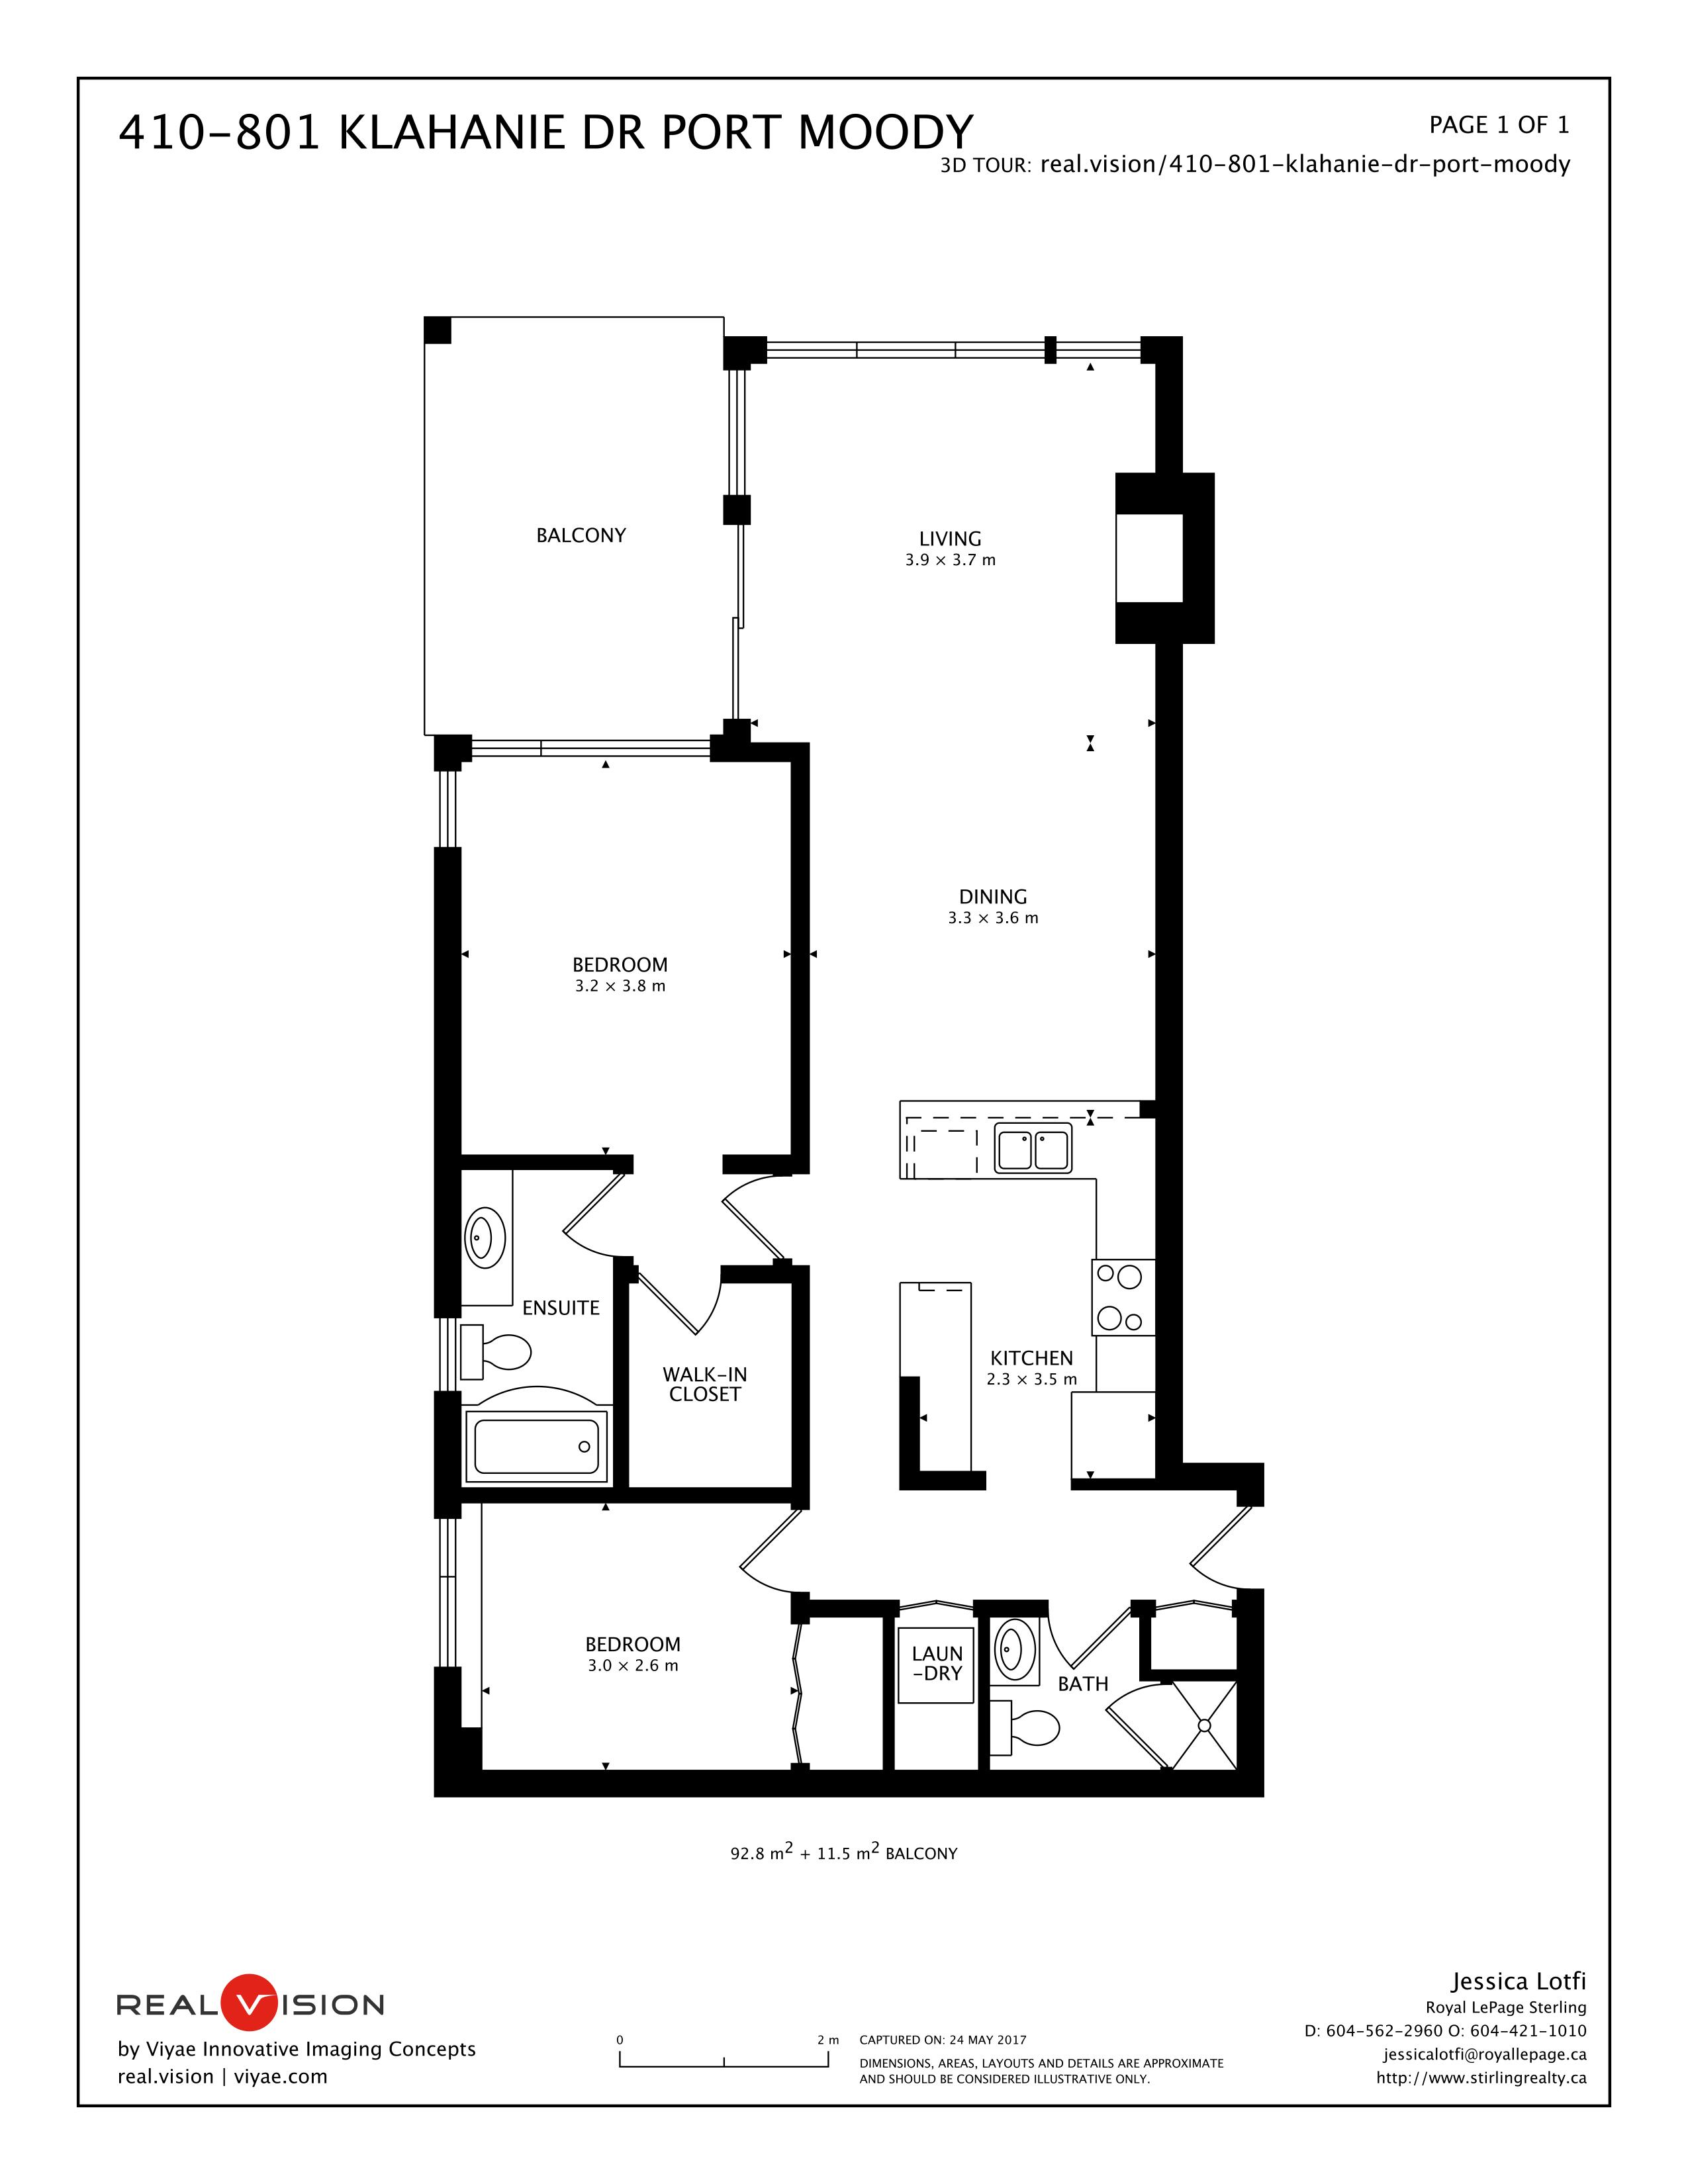 410 801 klahanie dr port moody download pdf download pdf download pdf download pdf ccuart Choice Image